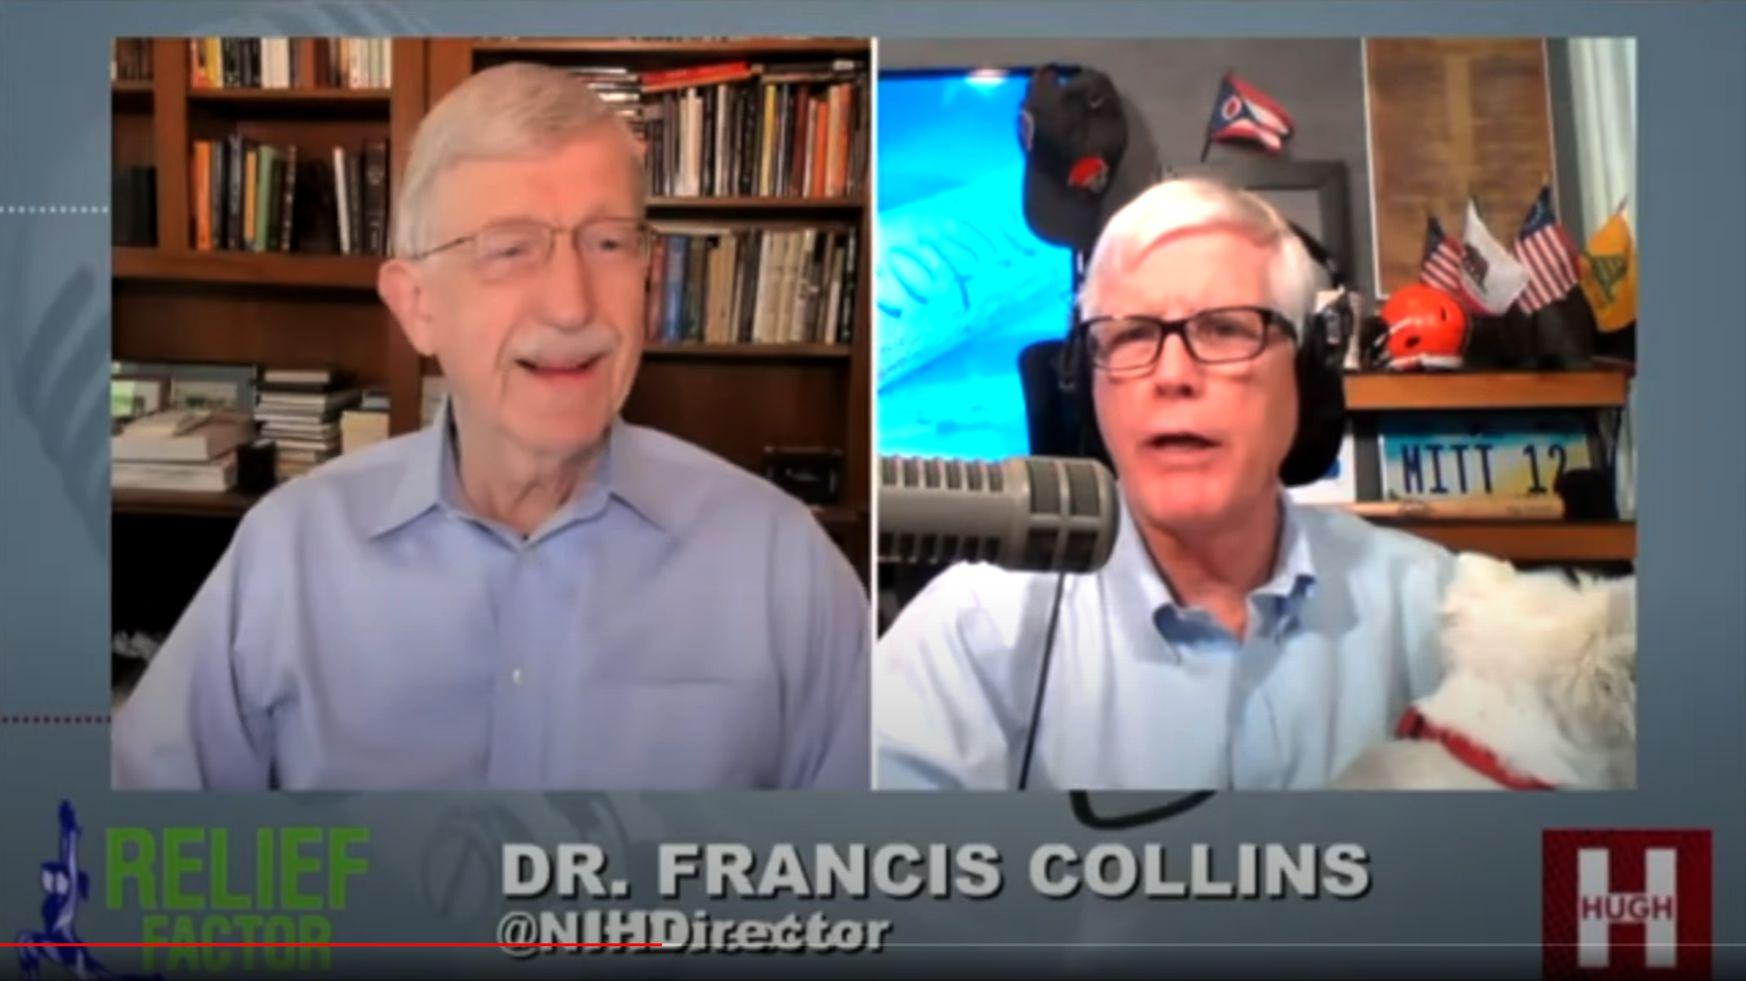 Dr. Francis Collins on Hugh Hewitt Show